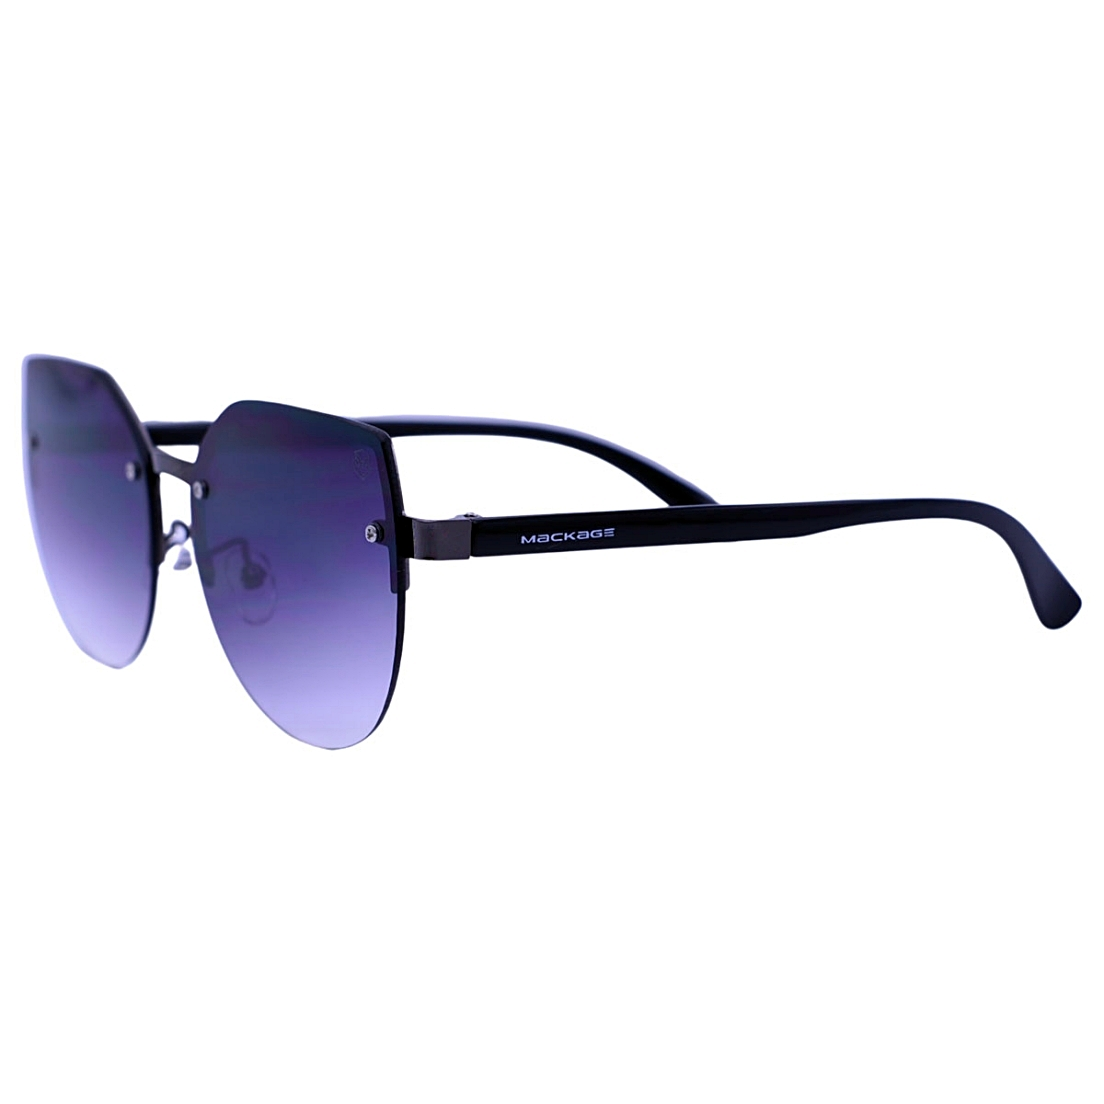 Óculos De Sol Mackage Feminino Acetato Gateado Rimless - Preto